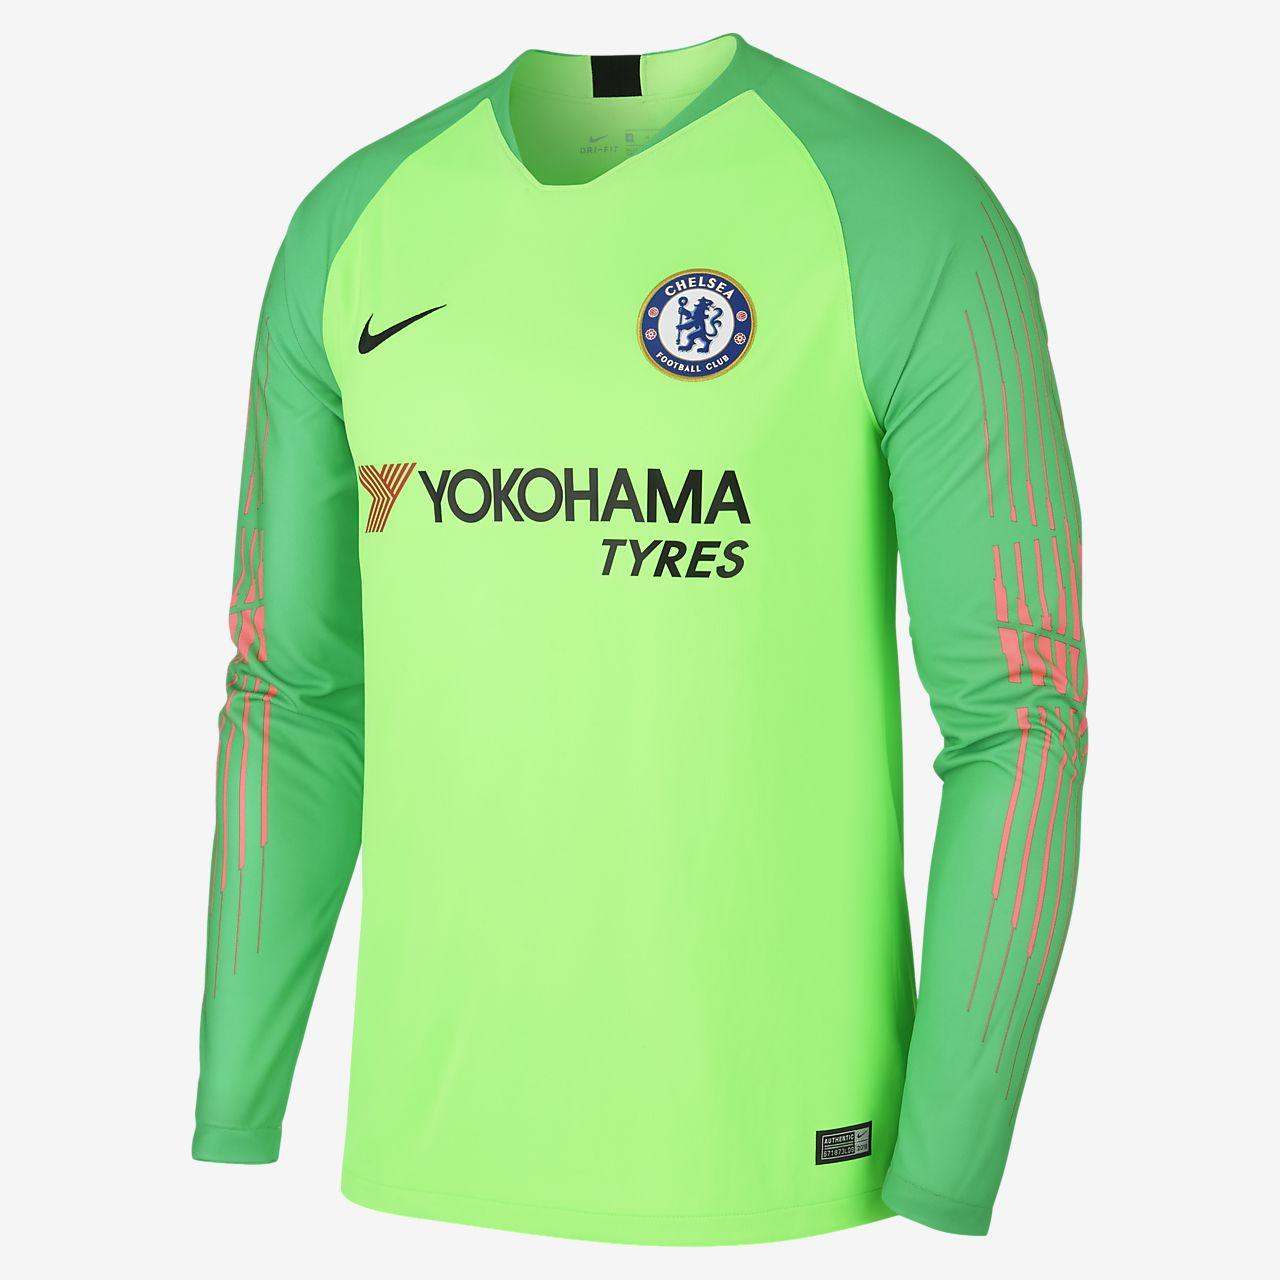 246a05a9 ... 2018/19 Chelsea FC Stadium Goalkeeper Camiseta de fútbol de manga larga  - Hombre